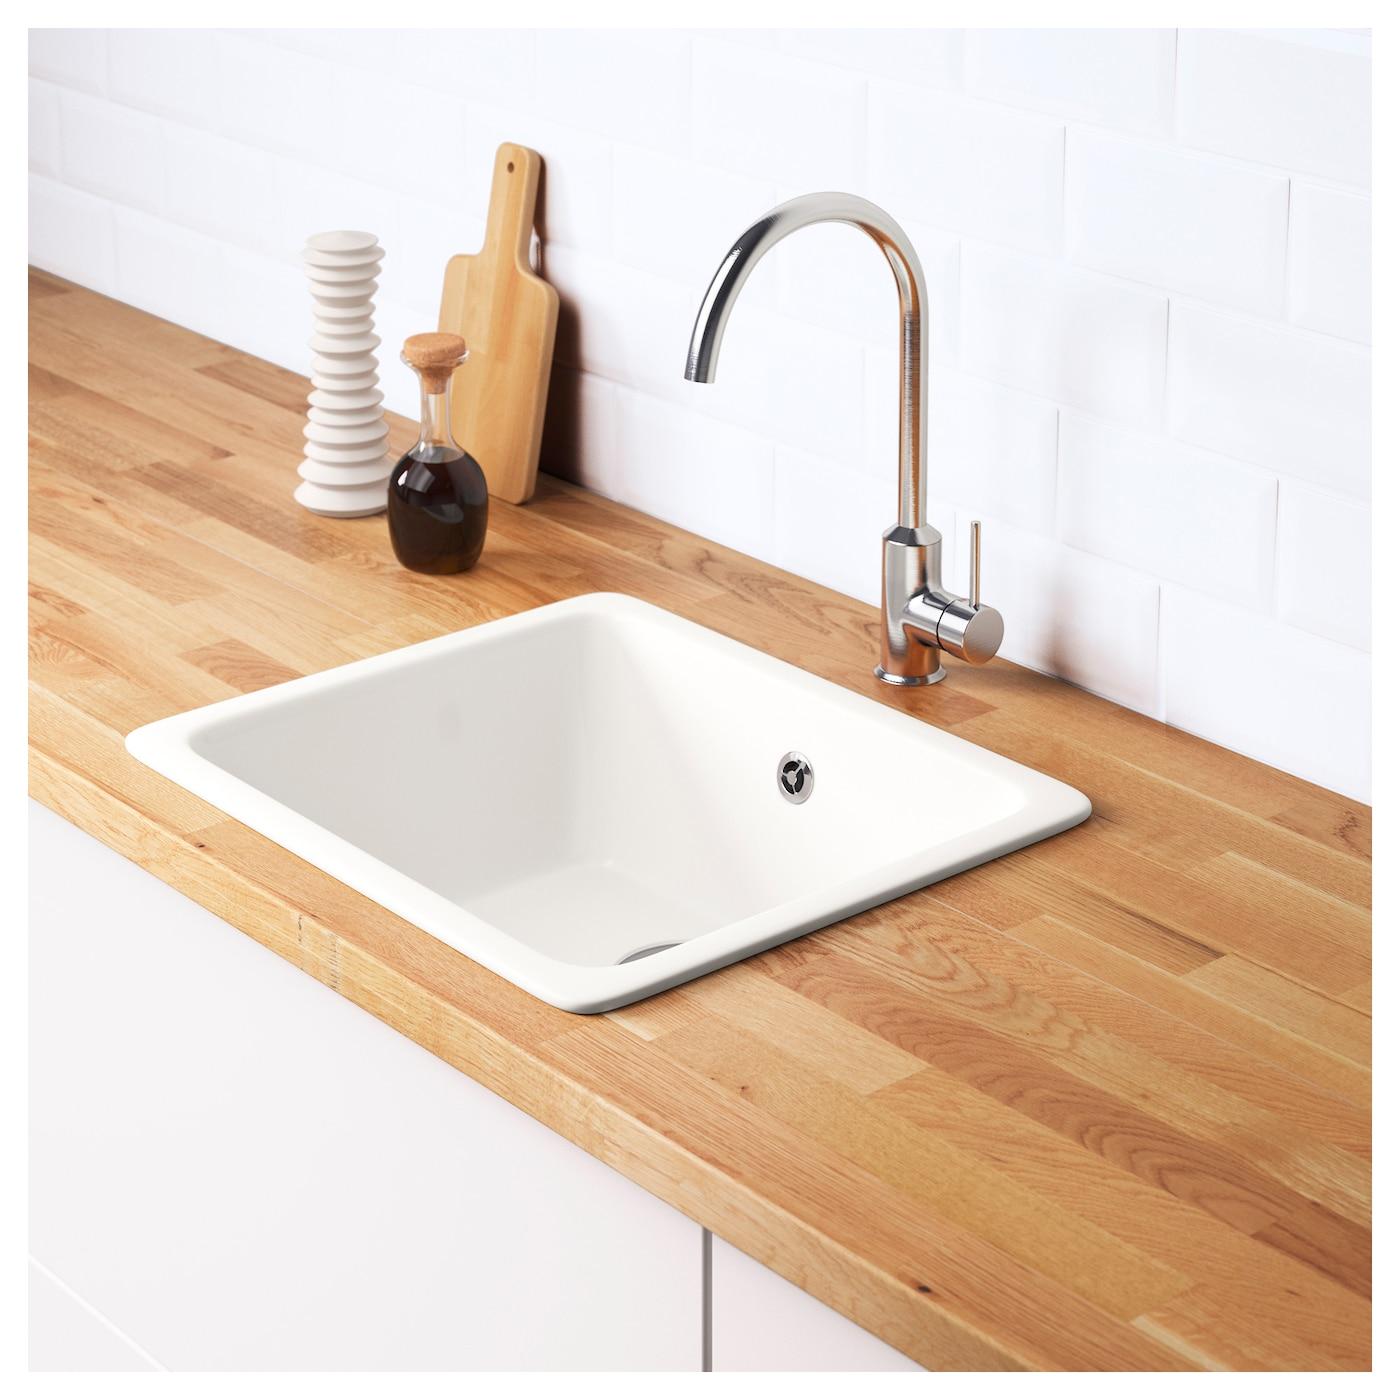 domsj inset sink 1 bowl white 53x45 cm ikea. Black Bedroom Furniture Sets. Home Design Ideas